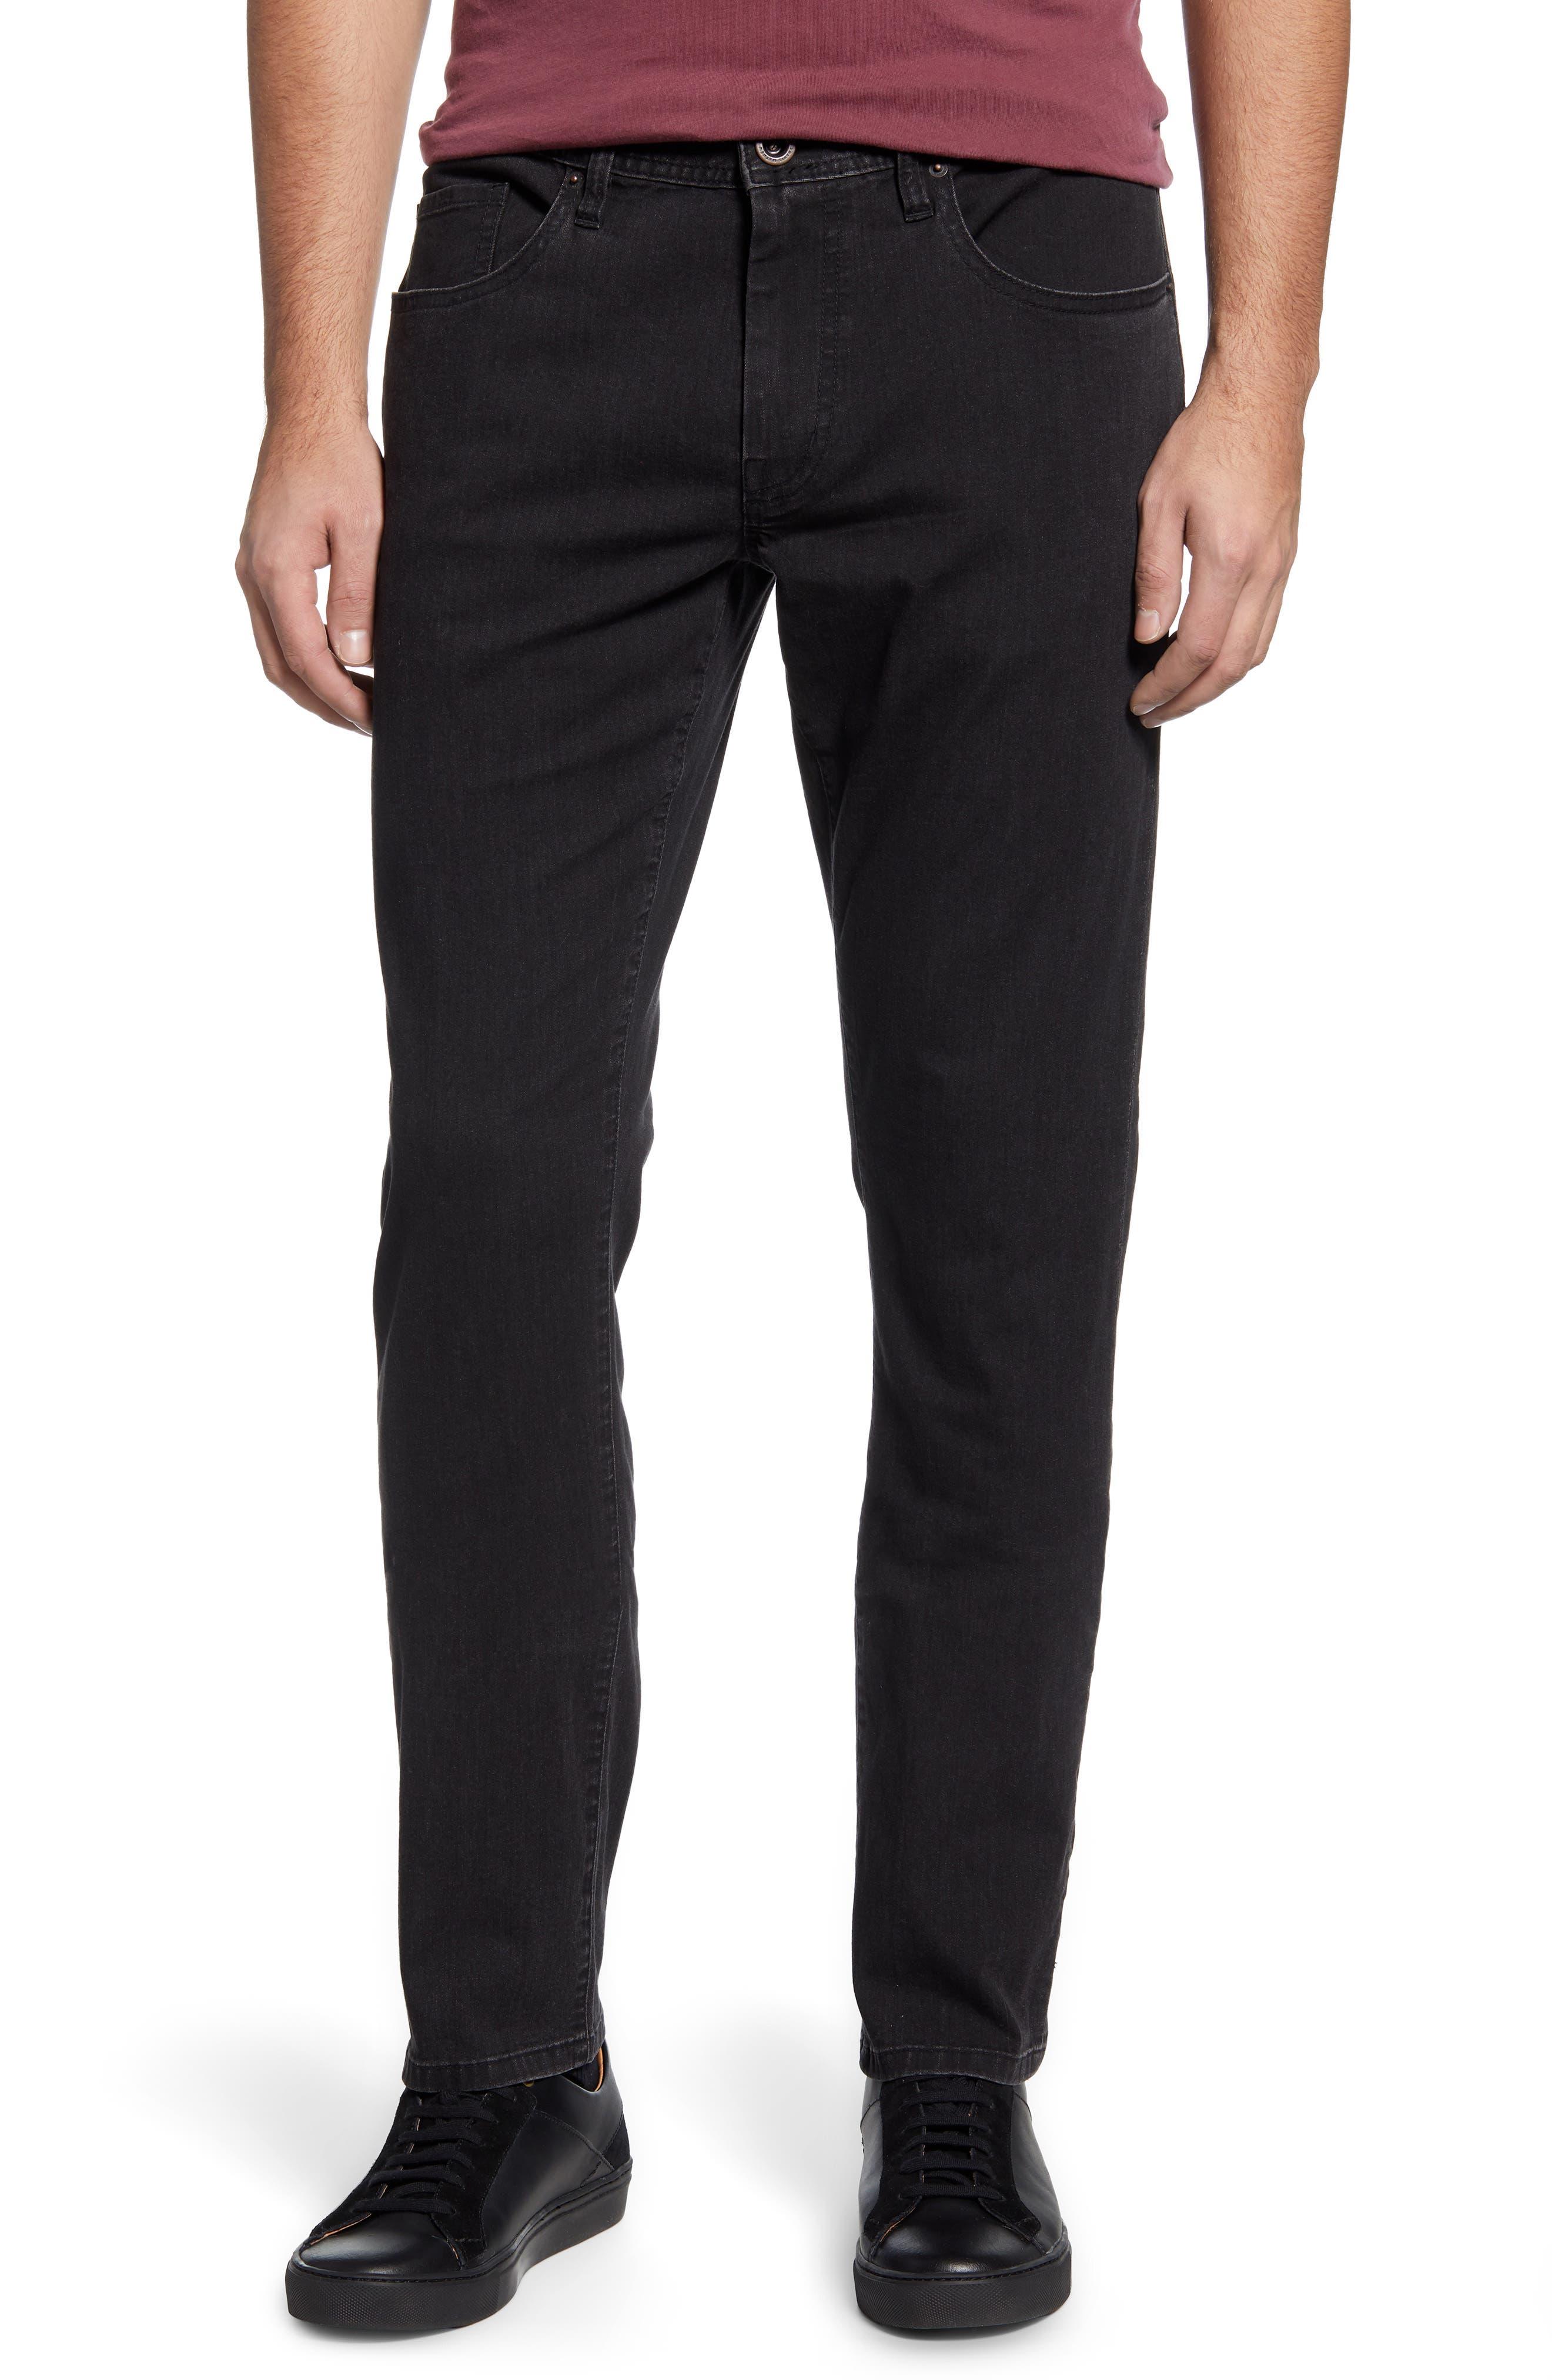 Image of TRAVIS MATHEW Legacy Denim Straight Jeans